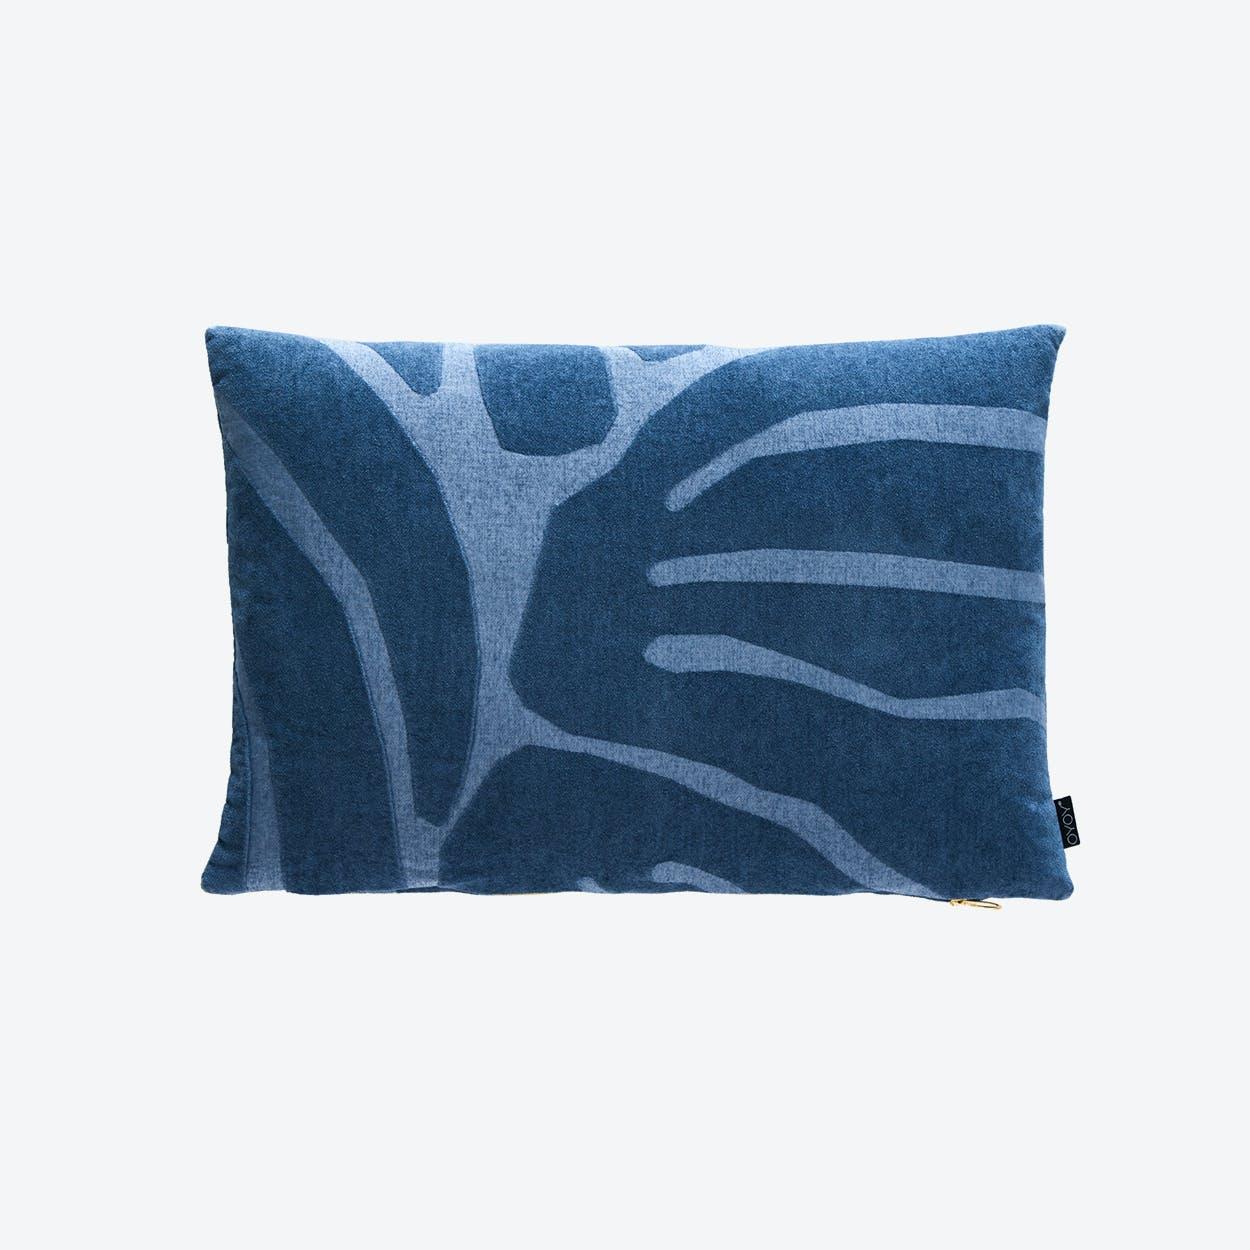 Roa Cushion in Flint Stone Blue